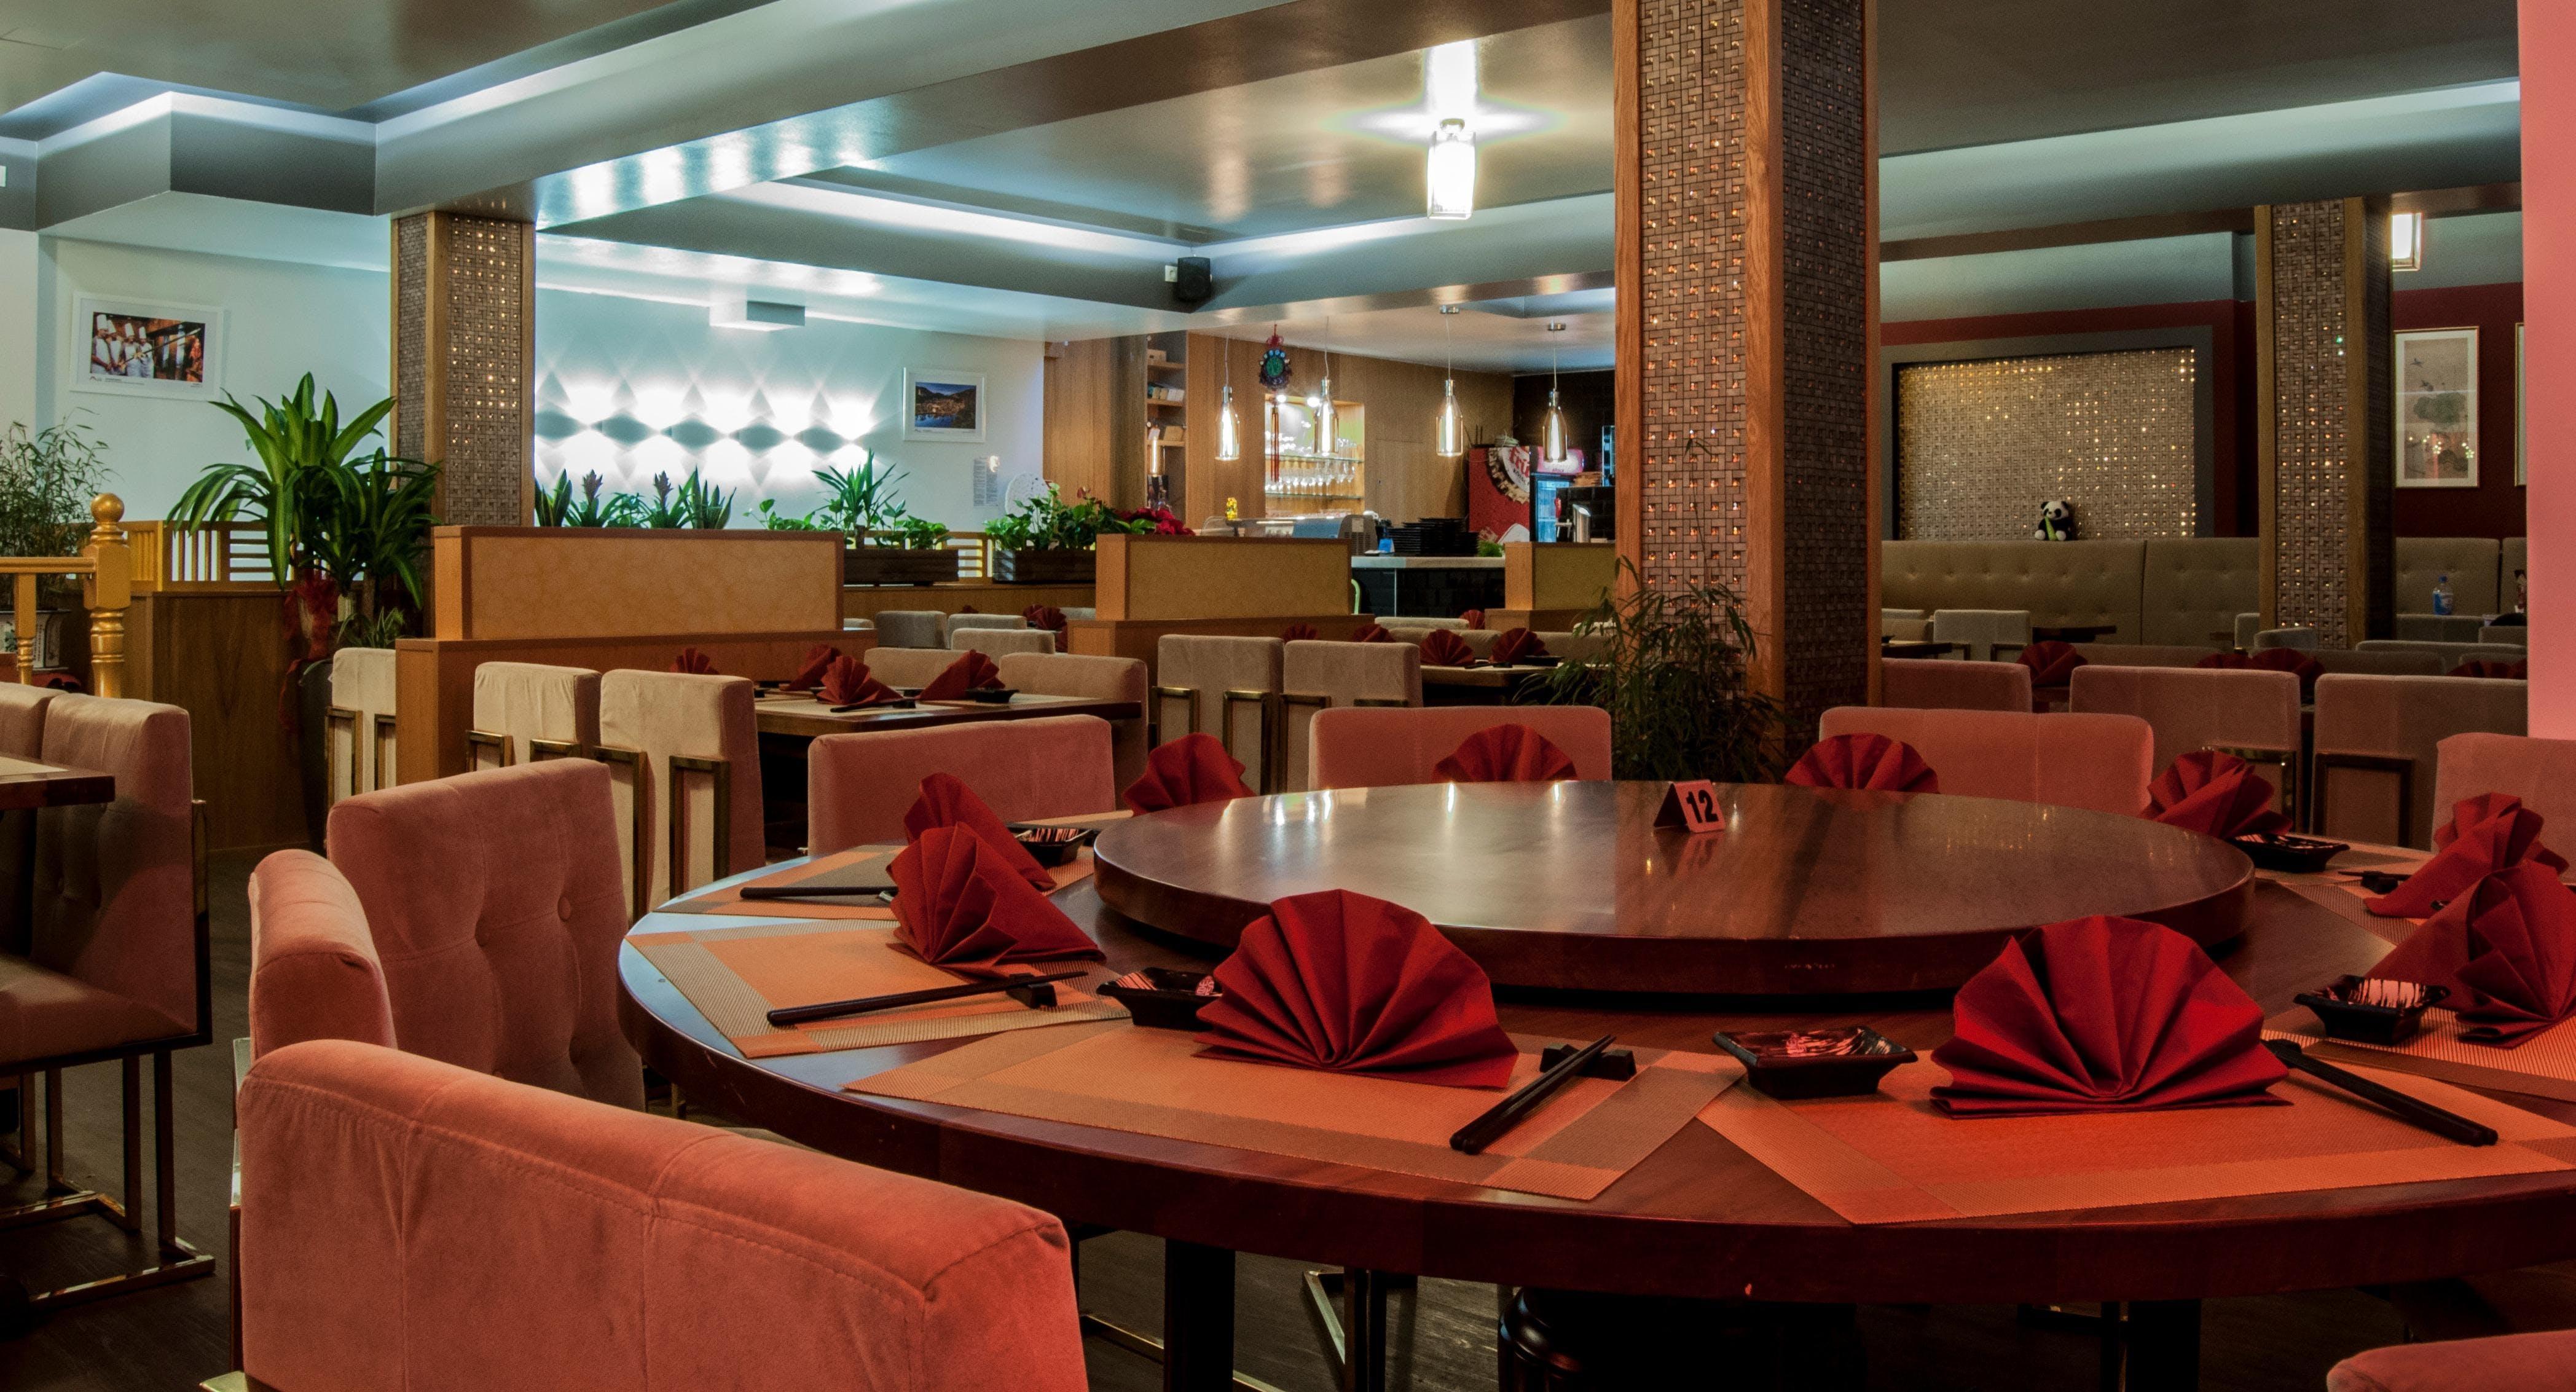 Chao | Asian Food & Sushi Köln image 2